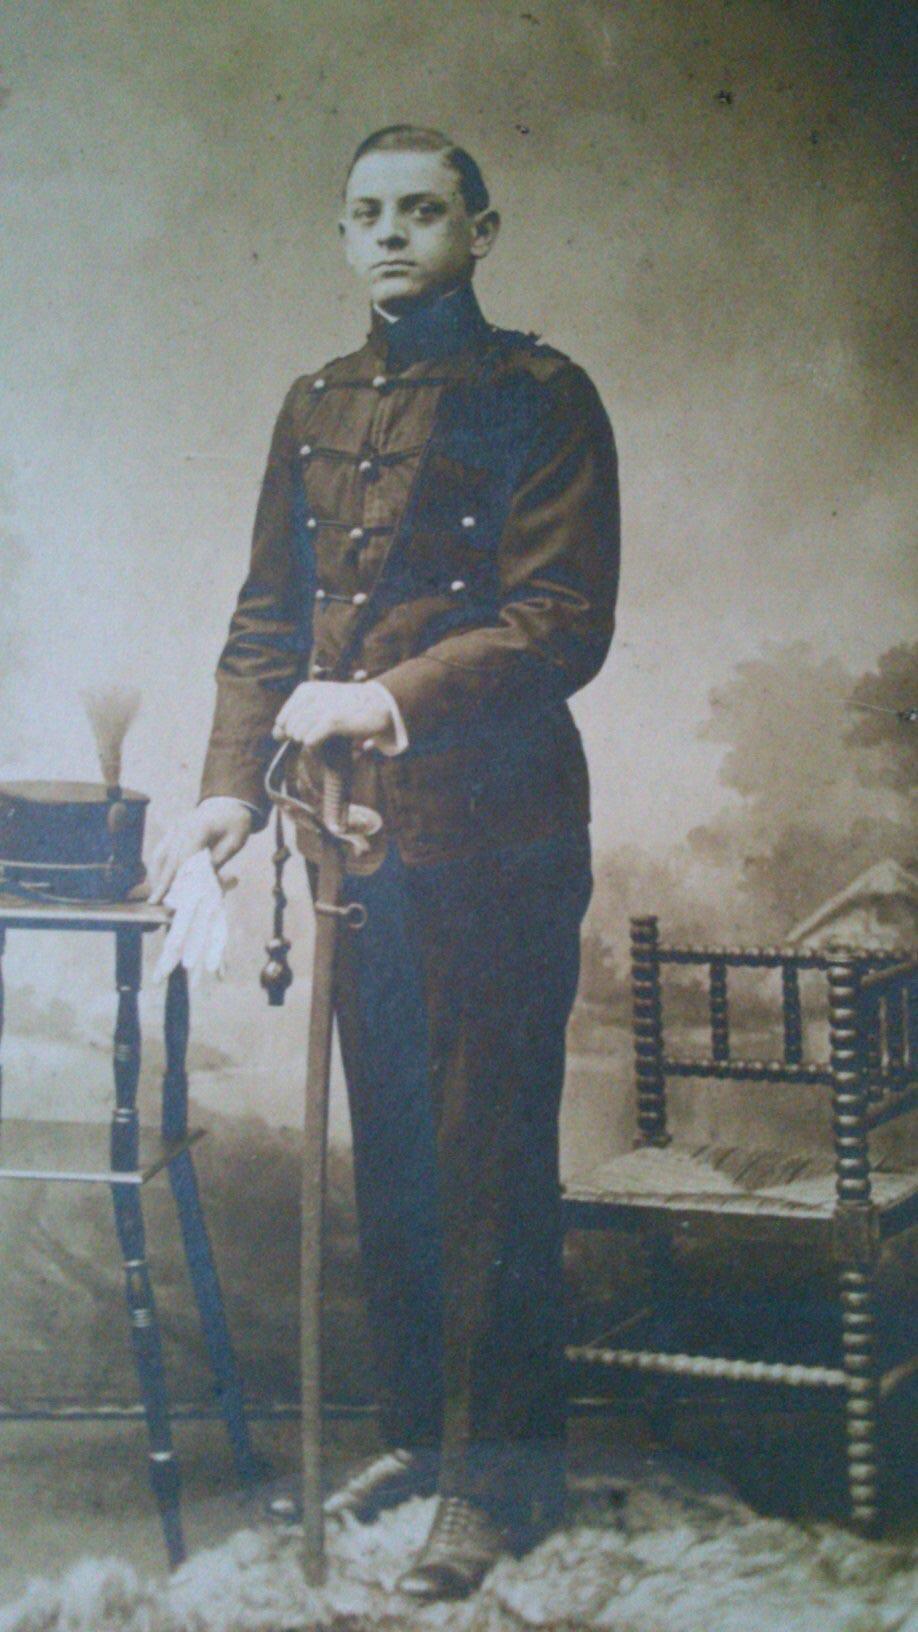 J.H. Gerardu ~1921